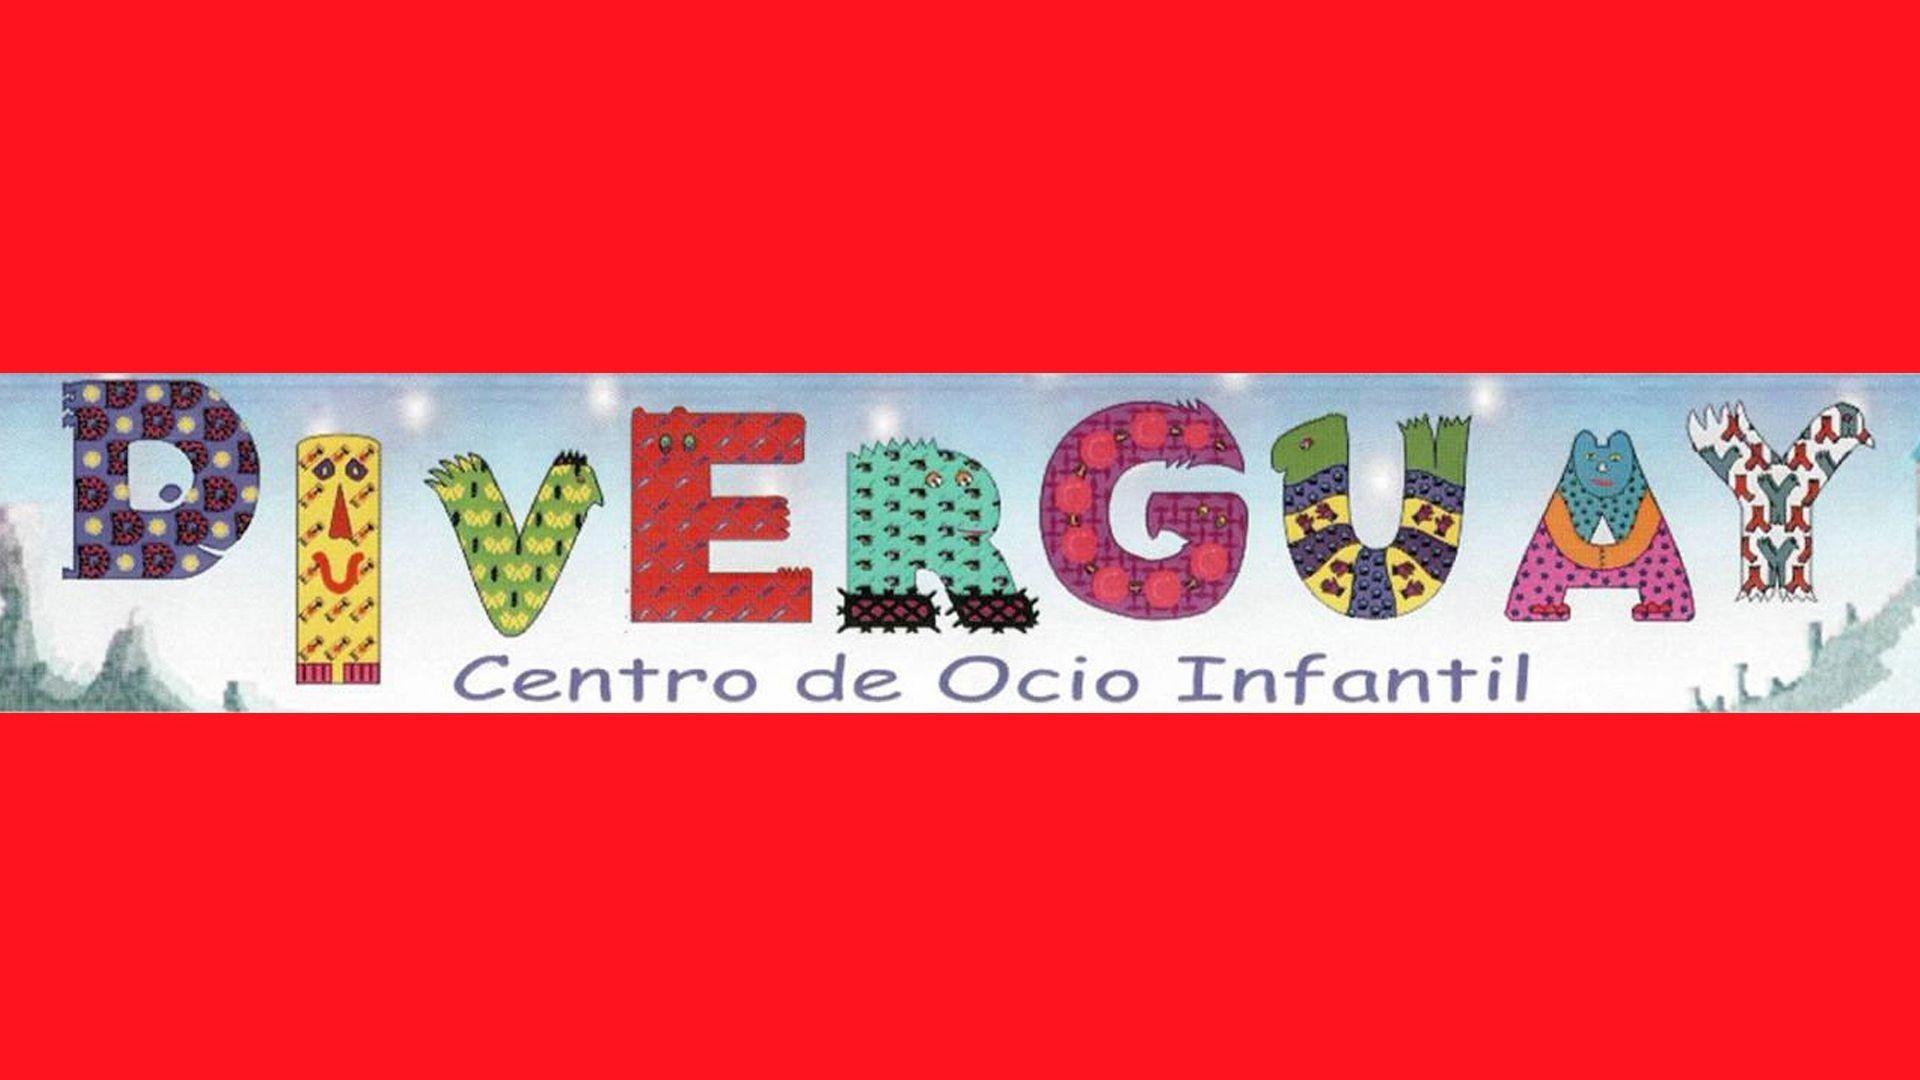 Centro de ocio infantil en Albacete